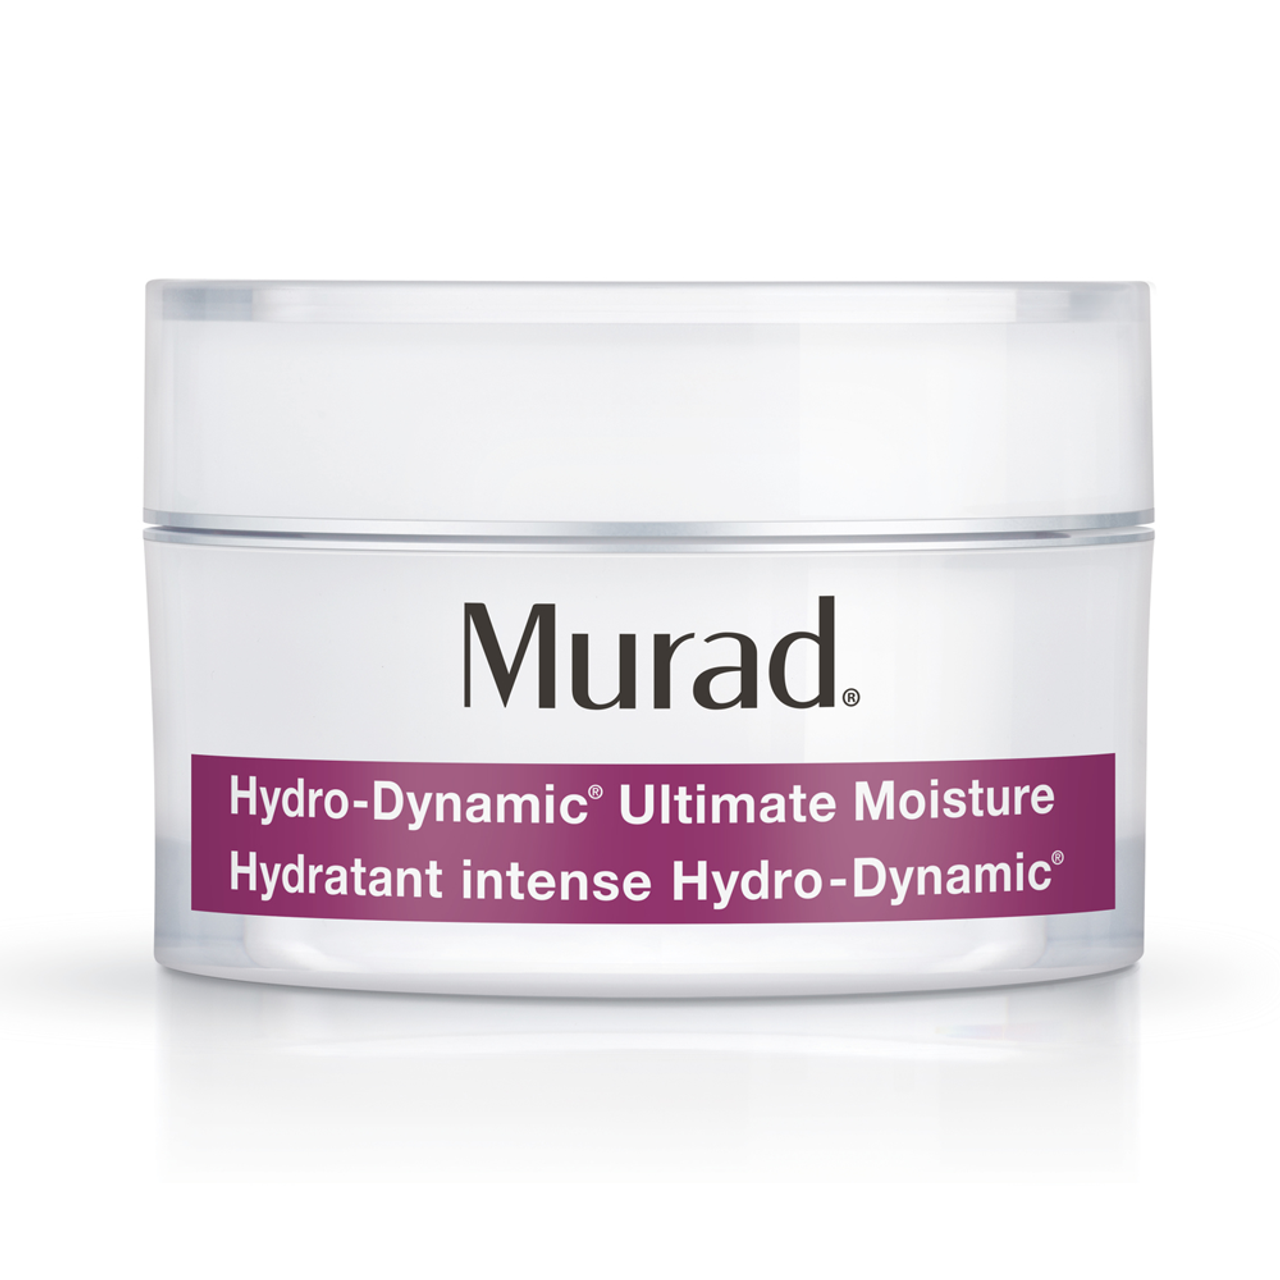 Murad Age Reform™ Hydro Dynamic Ultimate Moisture